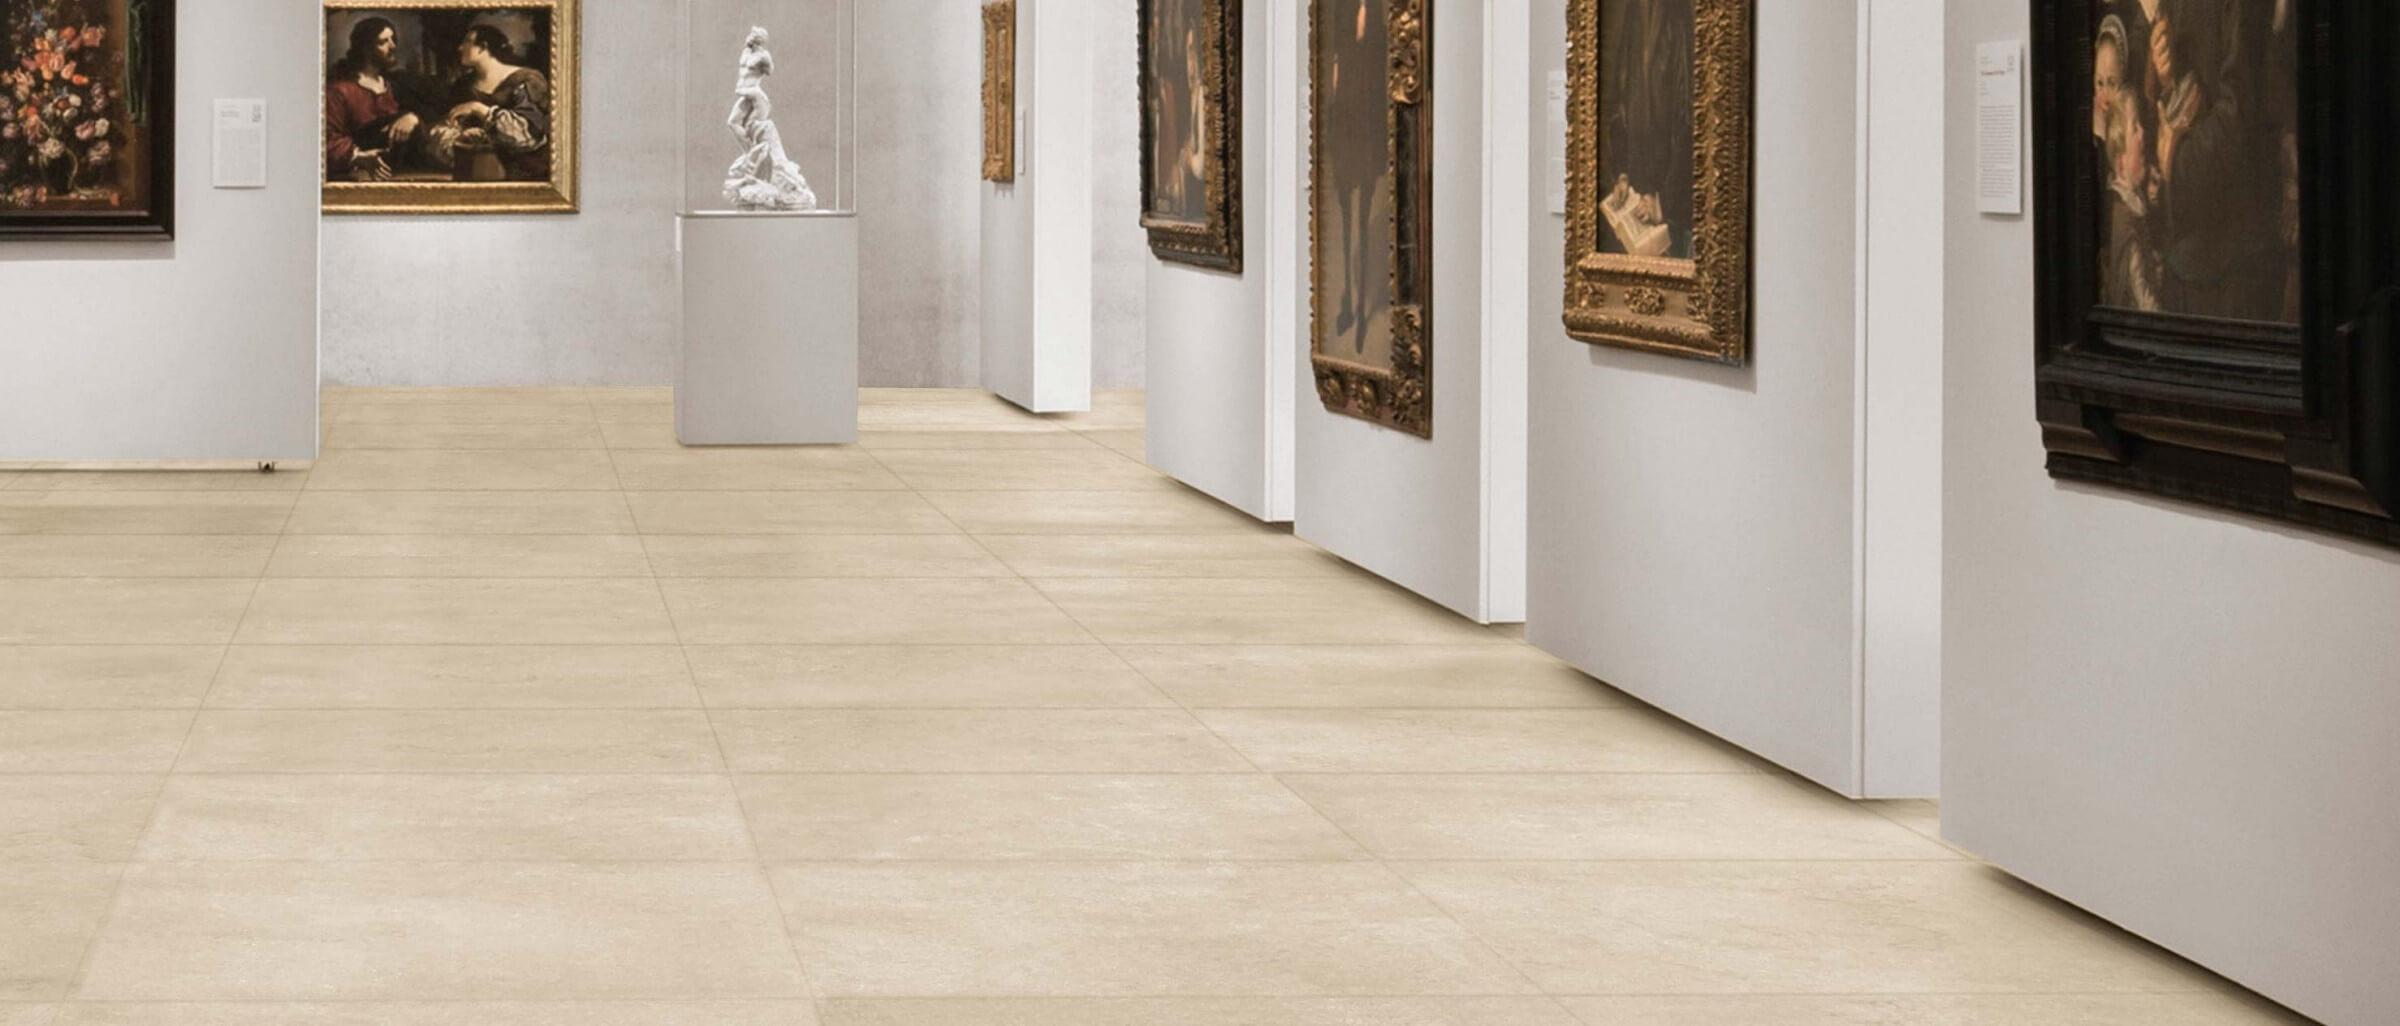 Margres Slabstone Flooring